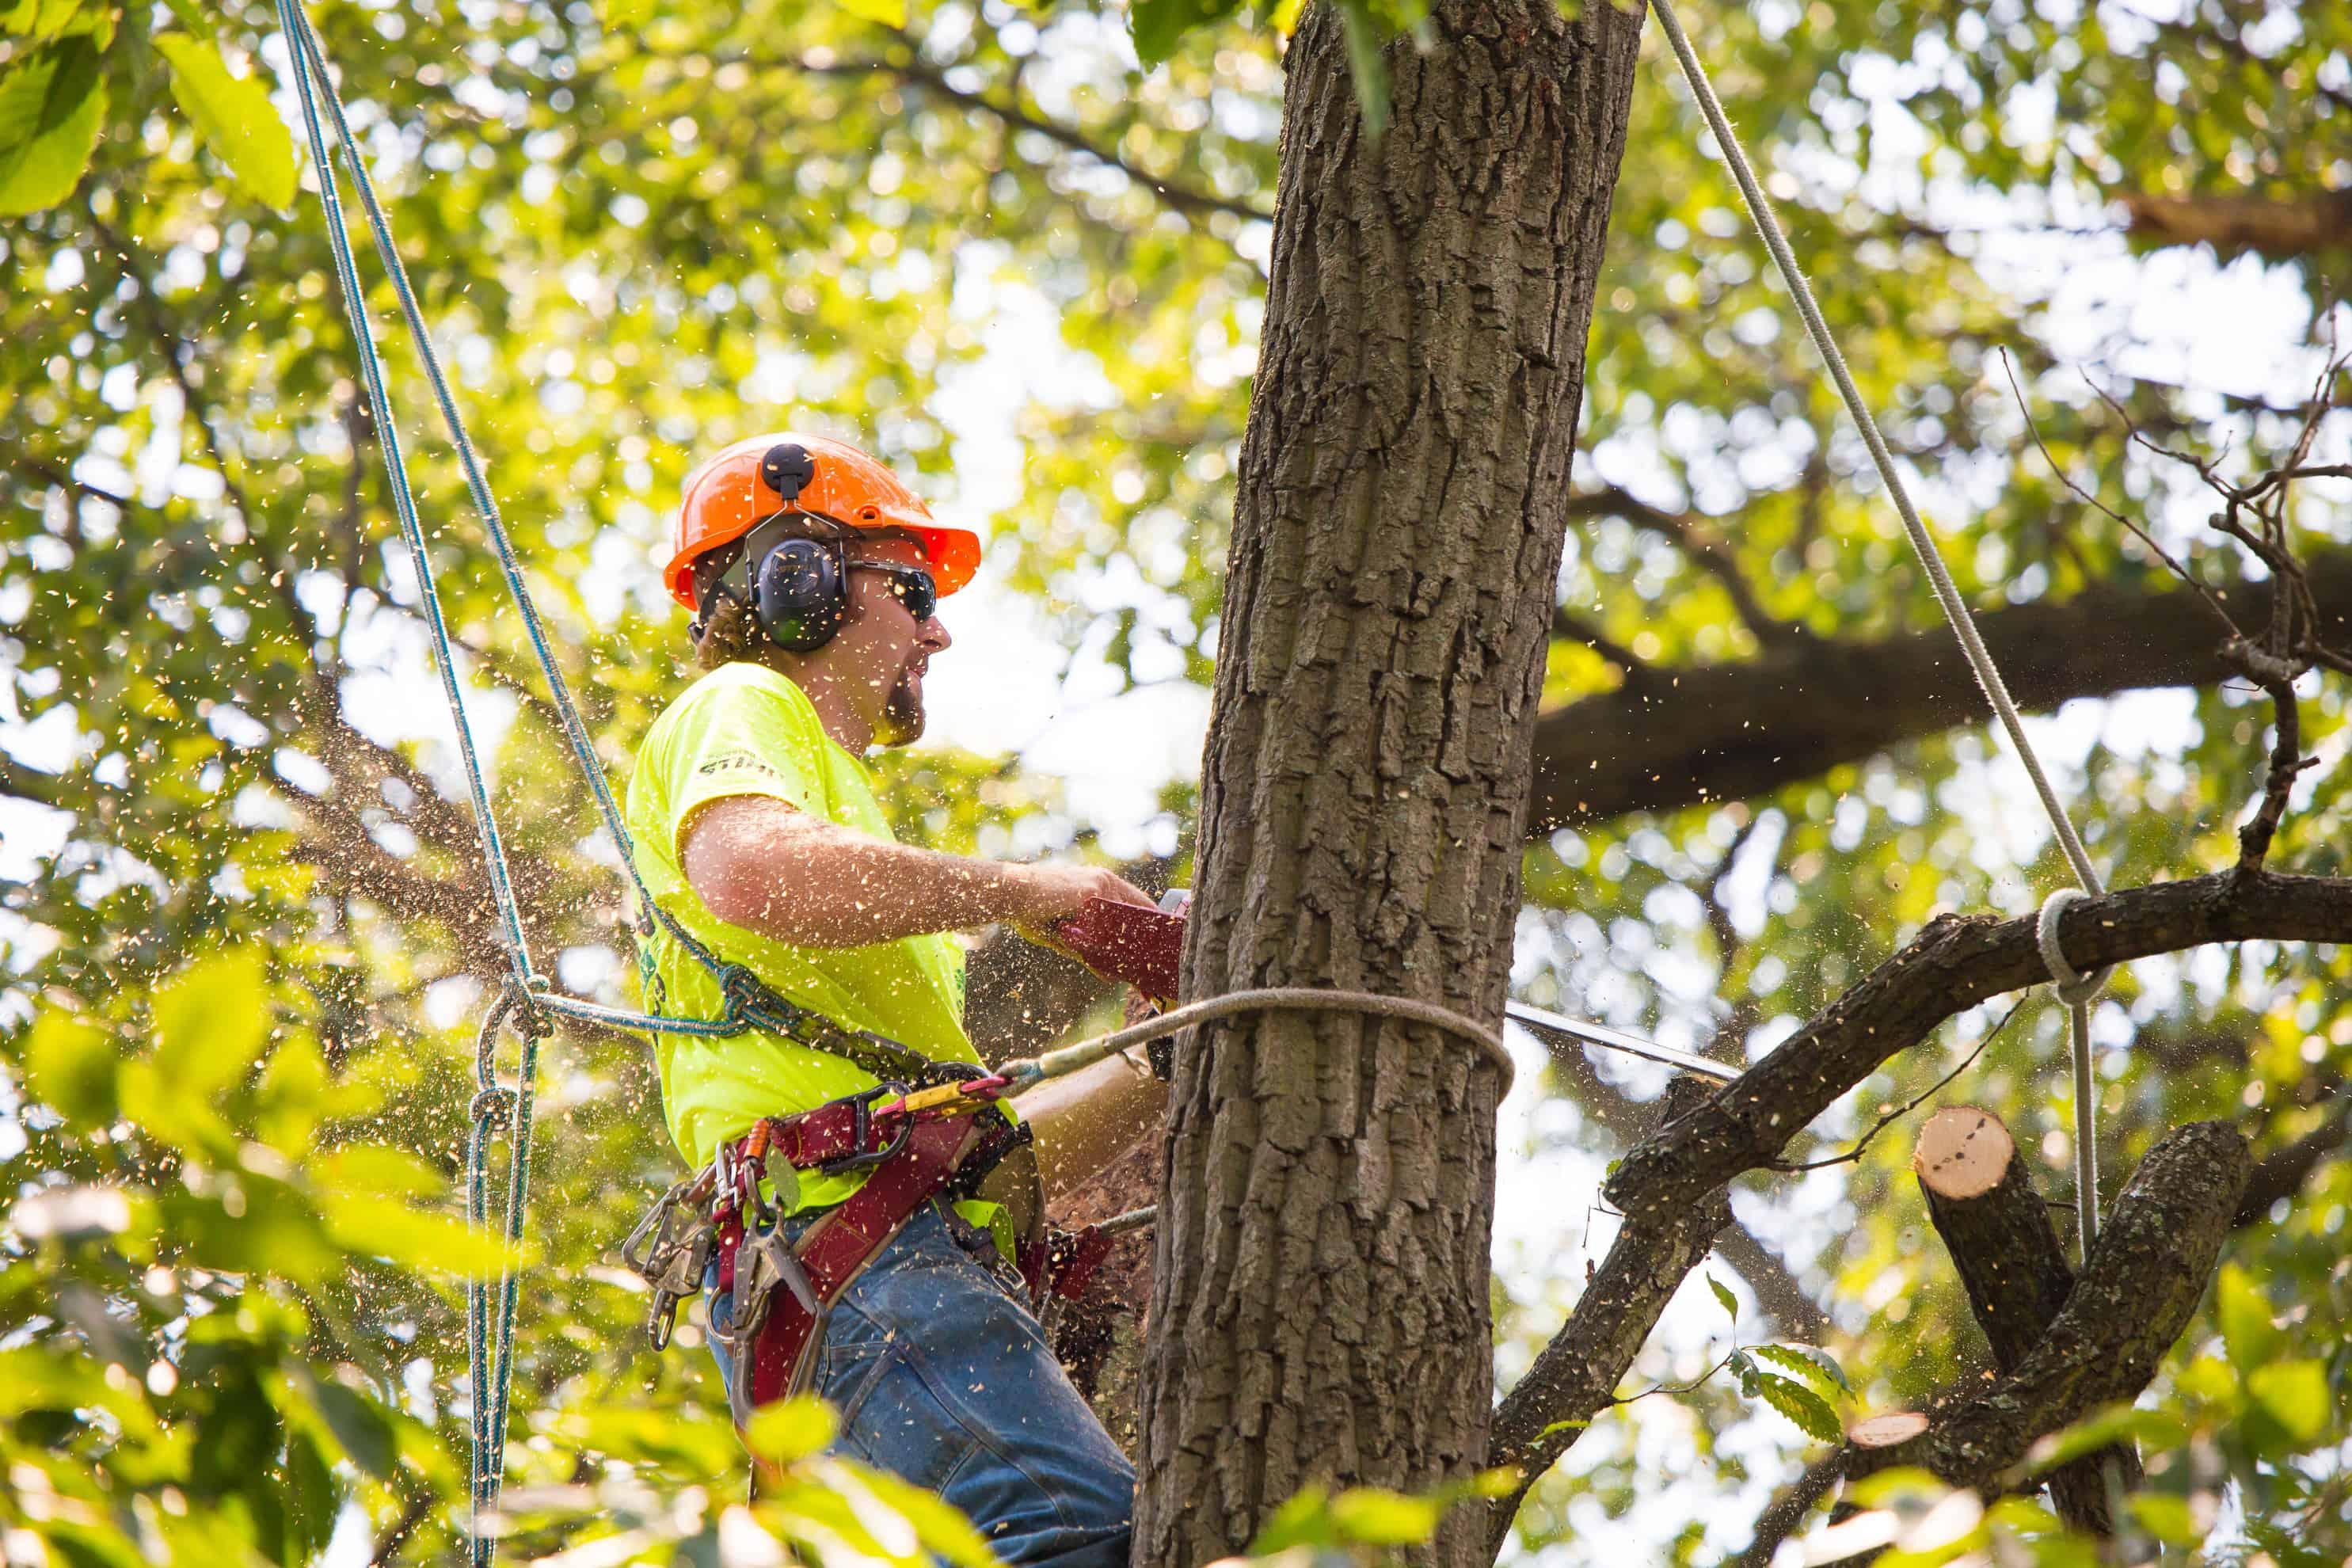 Arborist in Hard Hat Using Chainsaw on Tree